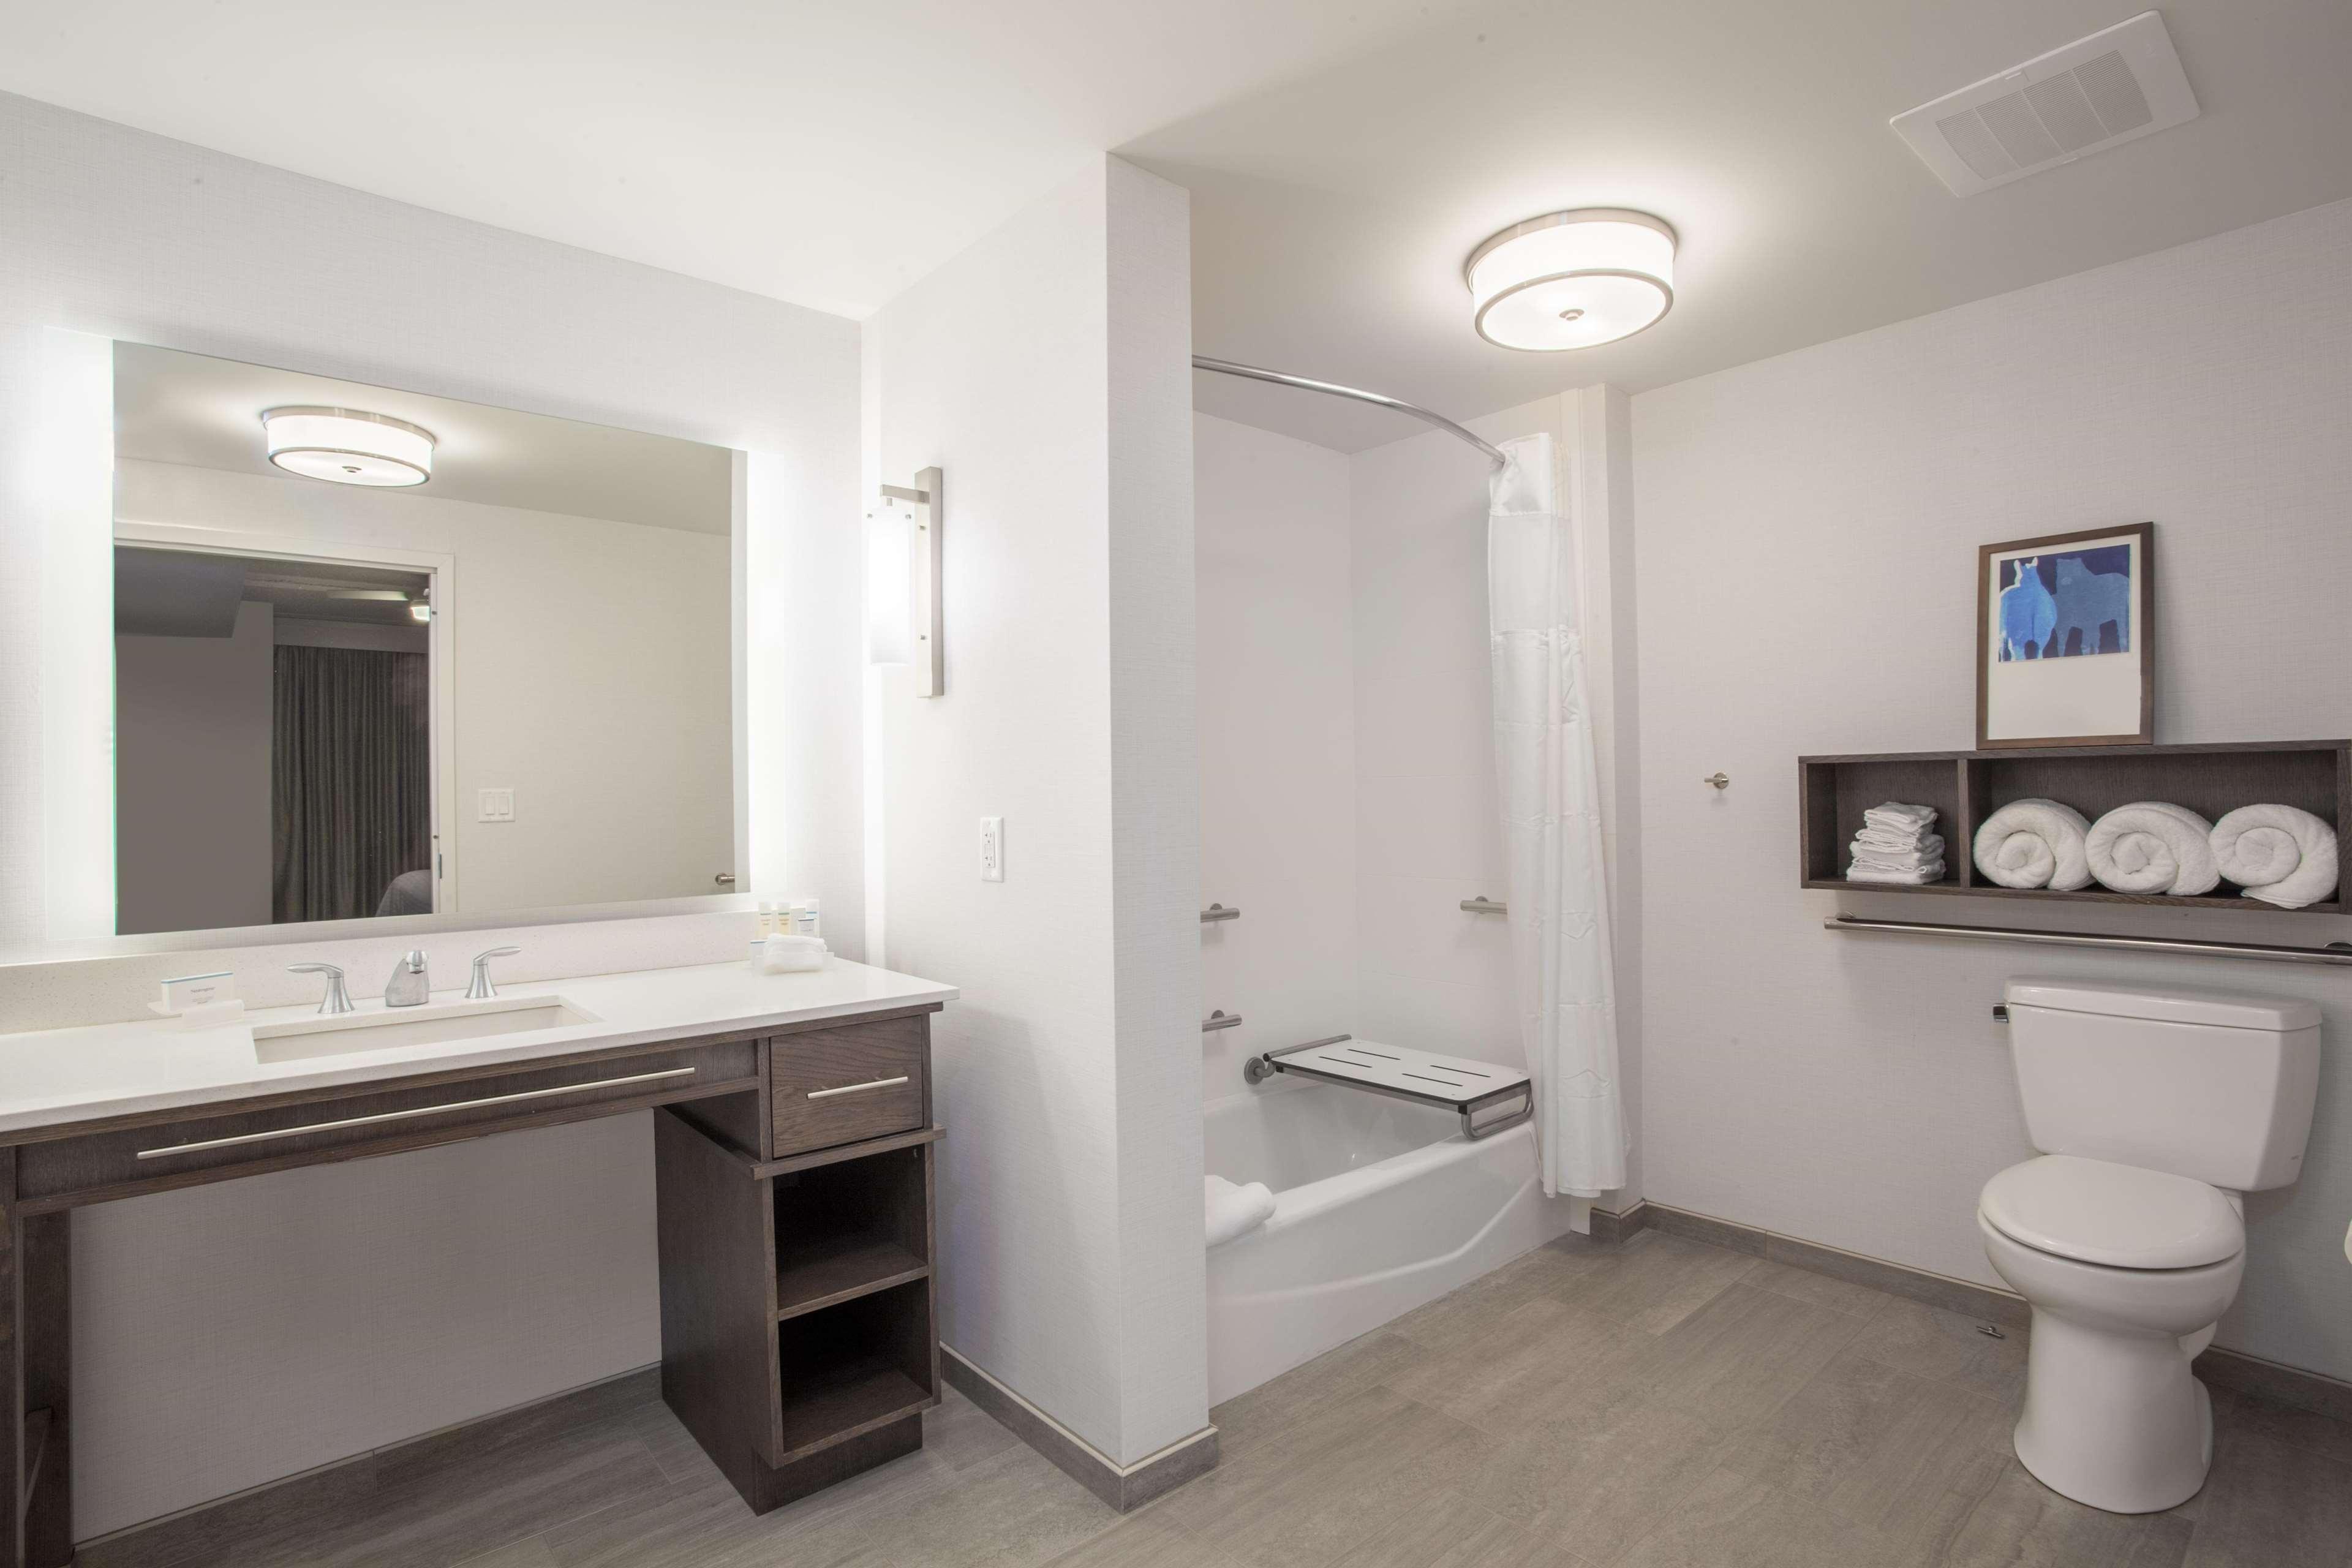 Homewood Suites by Hilton Saratoga Springs image 32